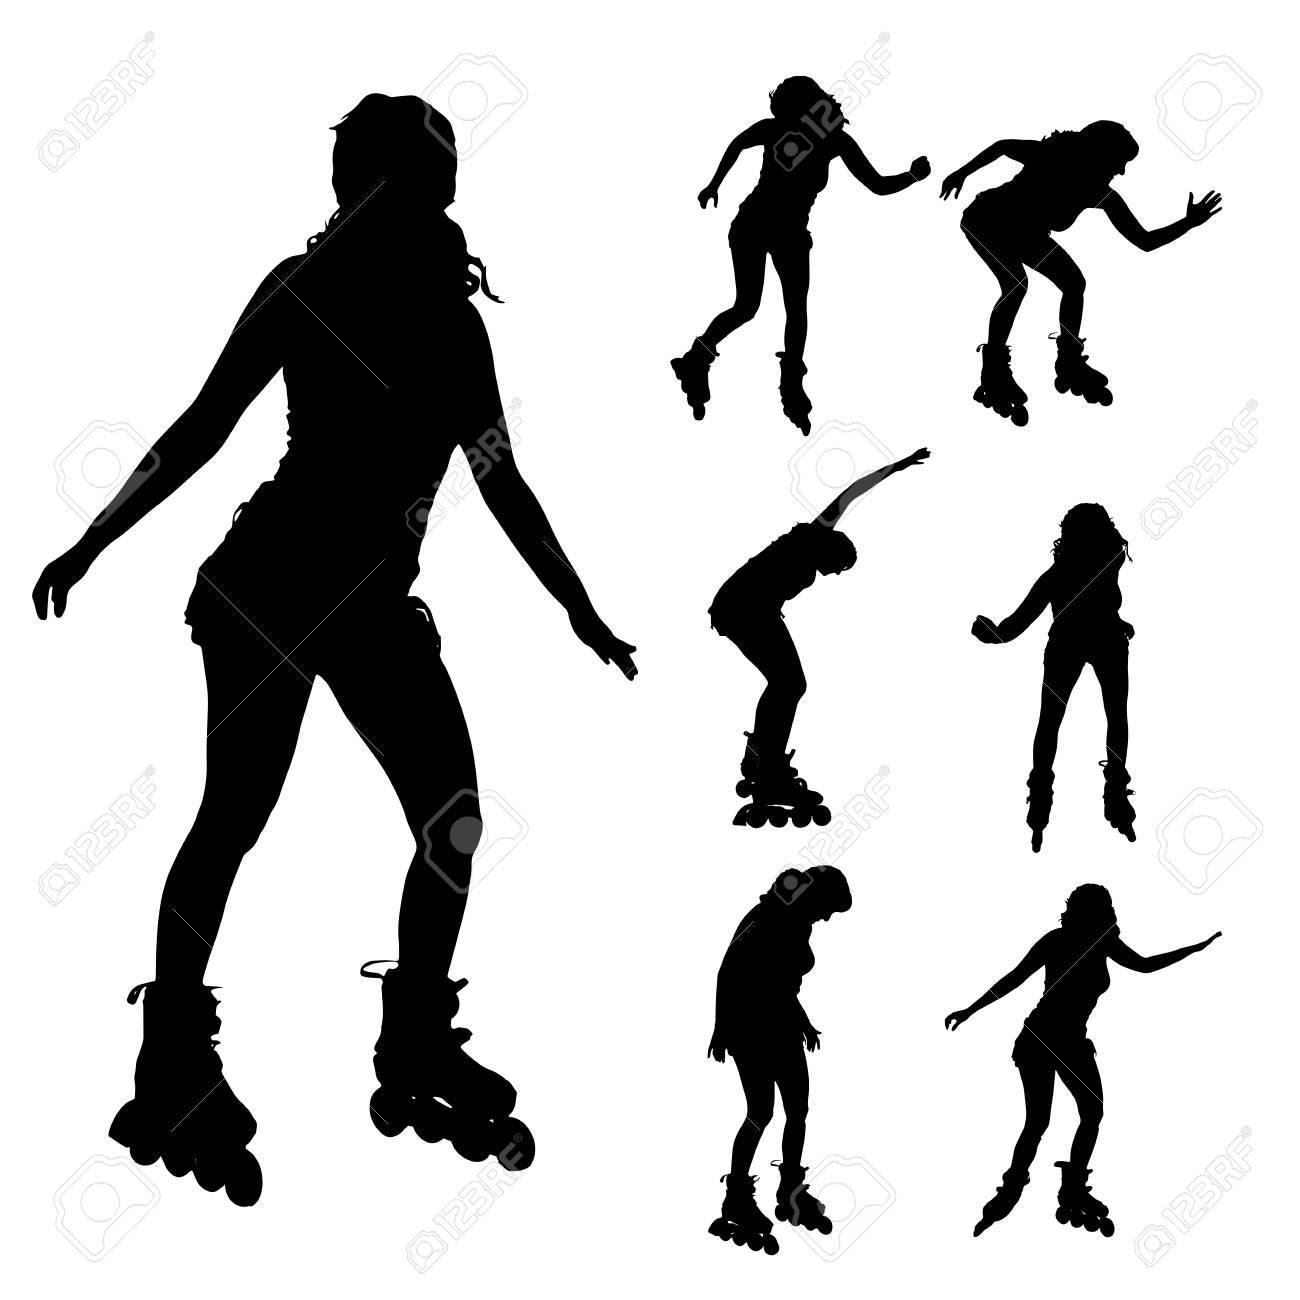 Roller skates for free - Vector Vector Silhouette Of A Woman On Roller Skates On Roller Skates